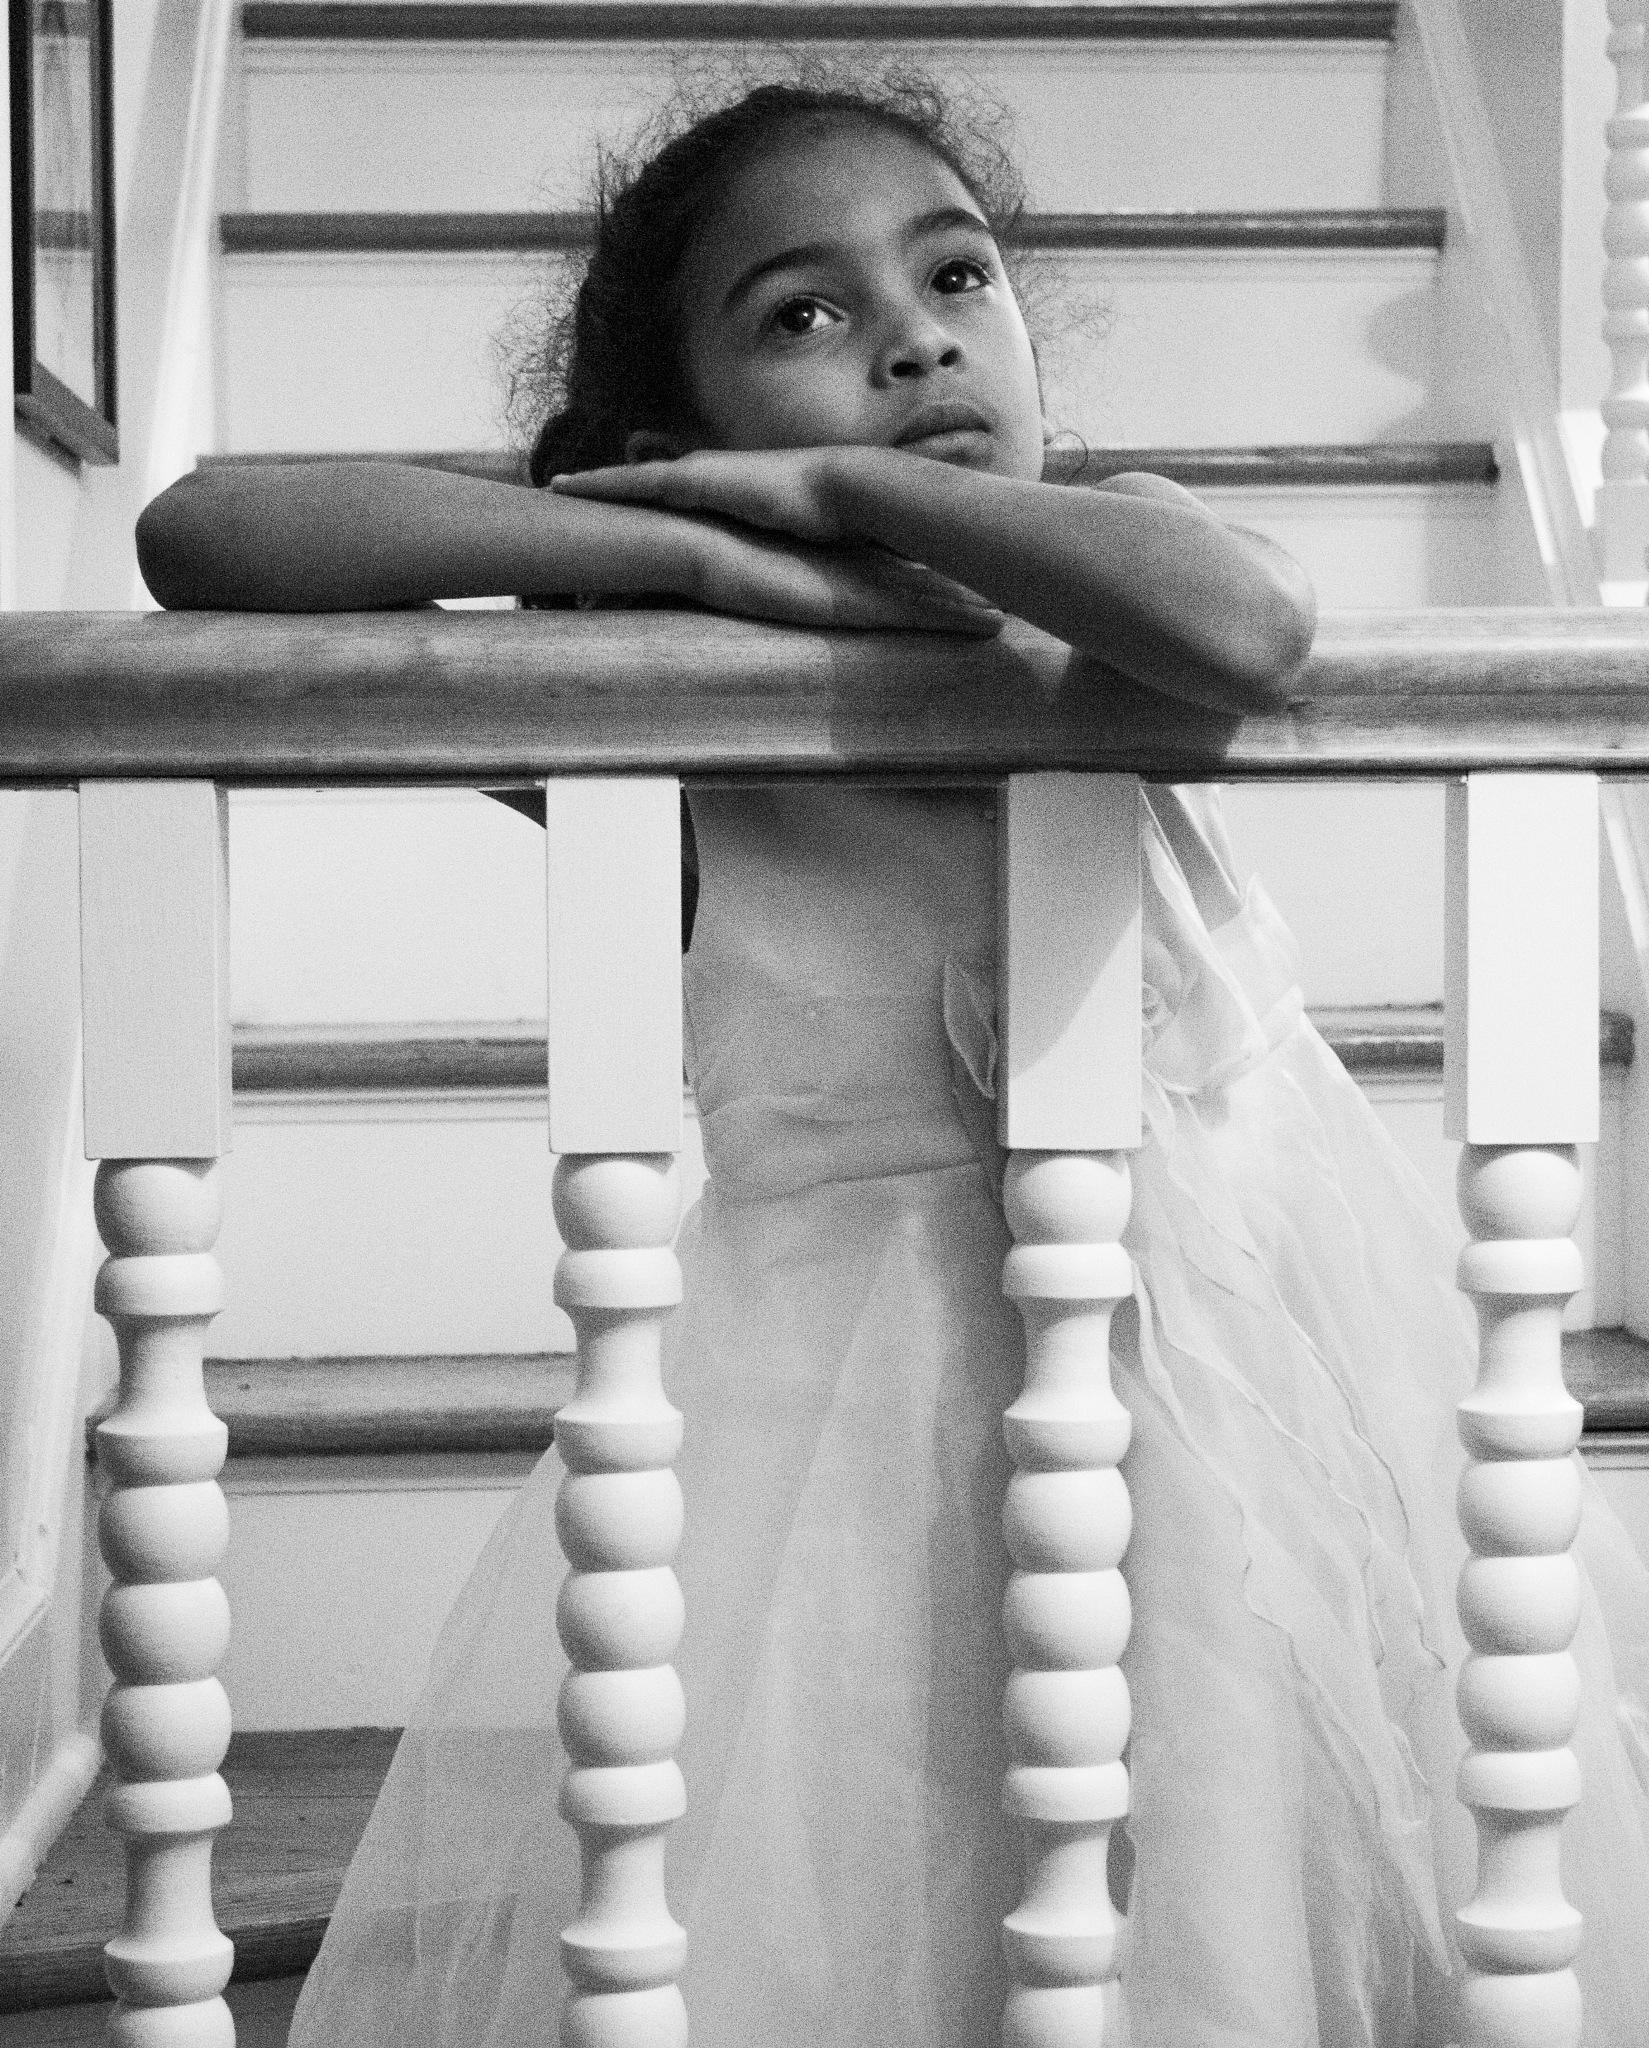 AVA DREAMING by Justine Cahn Fenu